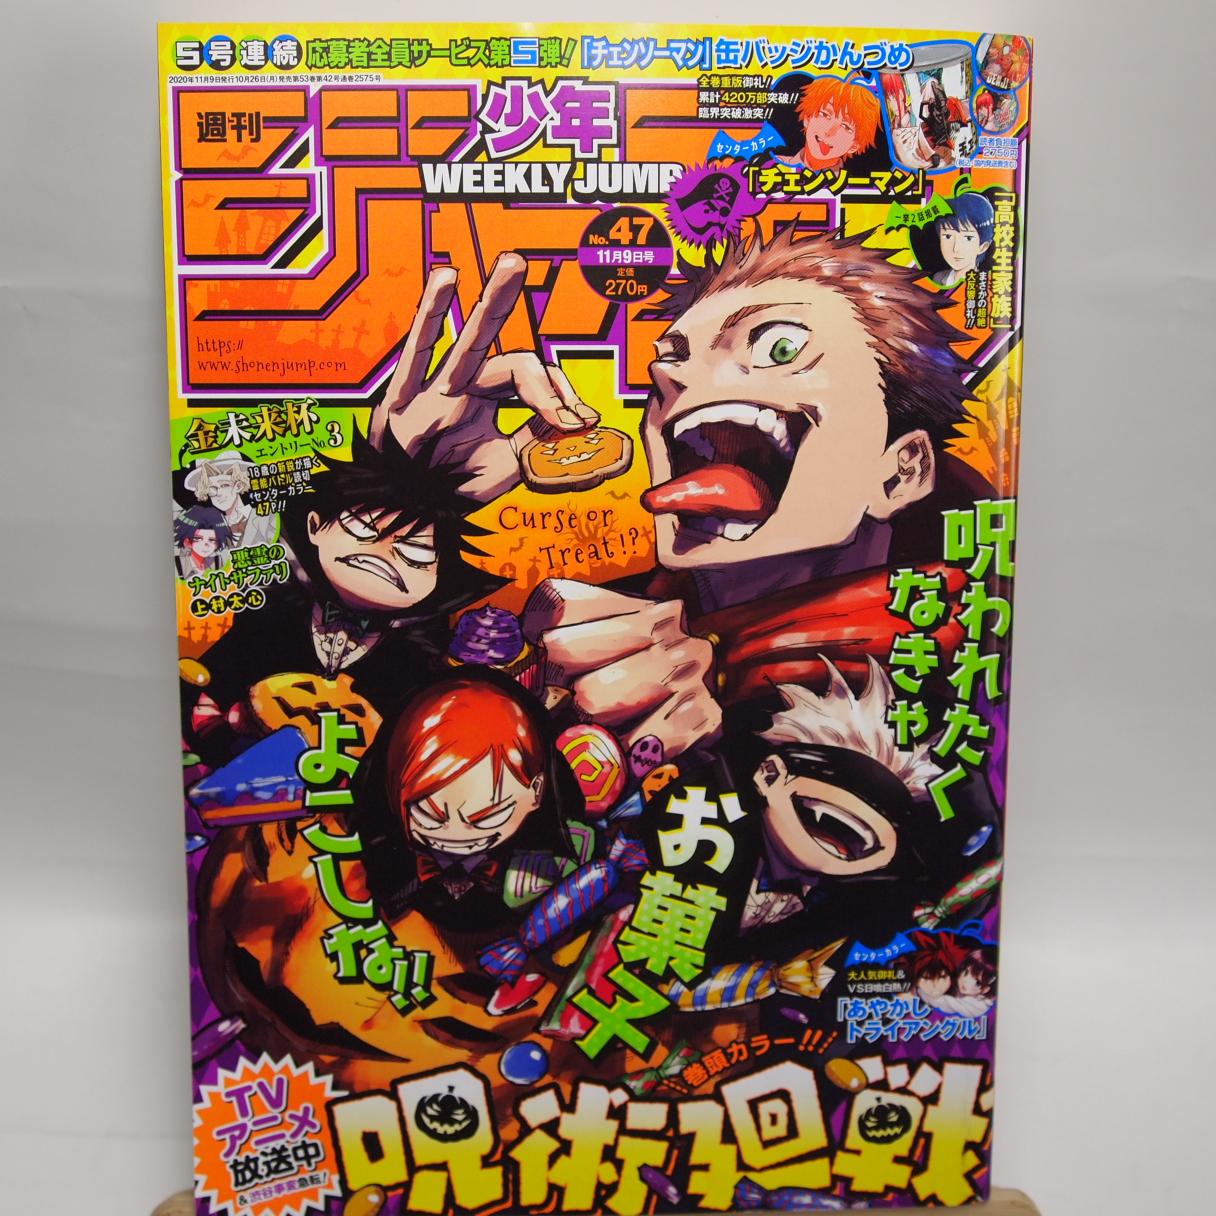 Weekly Shonen Jump 2020 No 47 Jujutsu Kaisen Anime Japan Manga Comic Magazine 4910299321105 Ebay